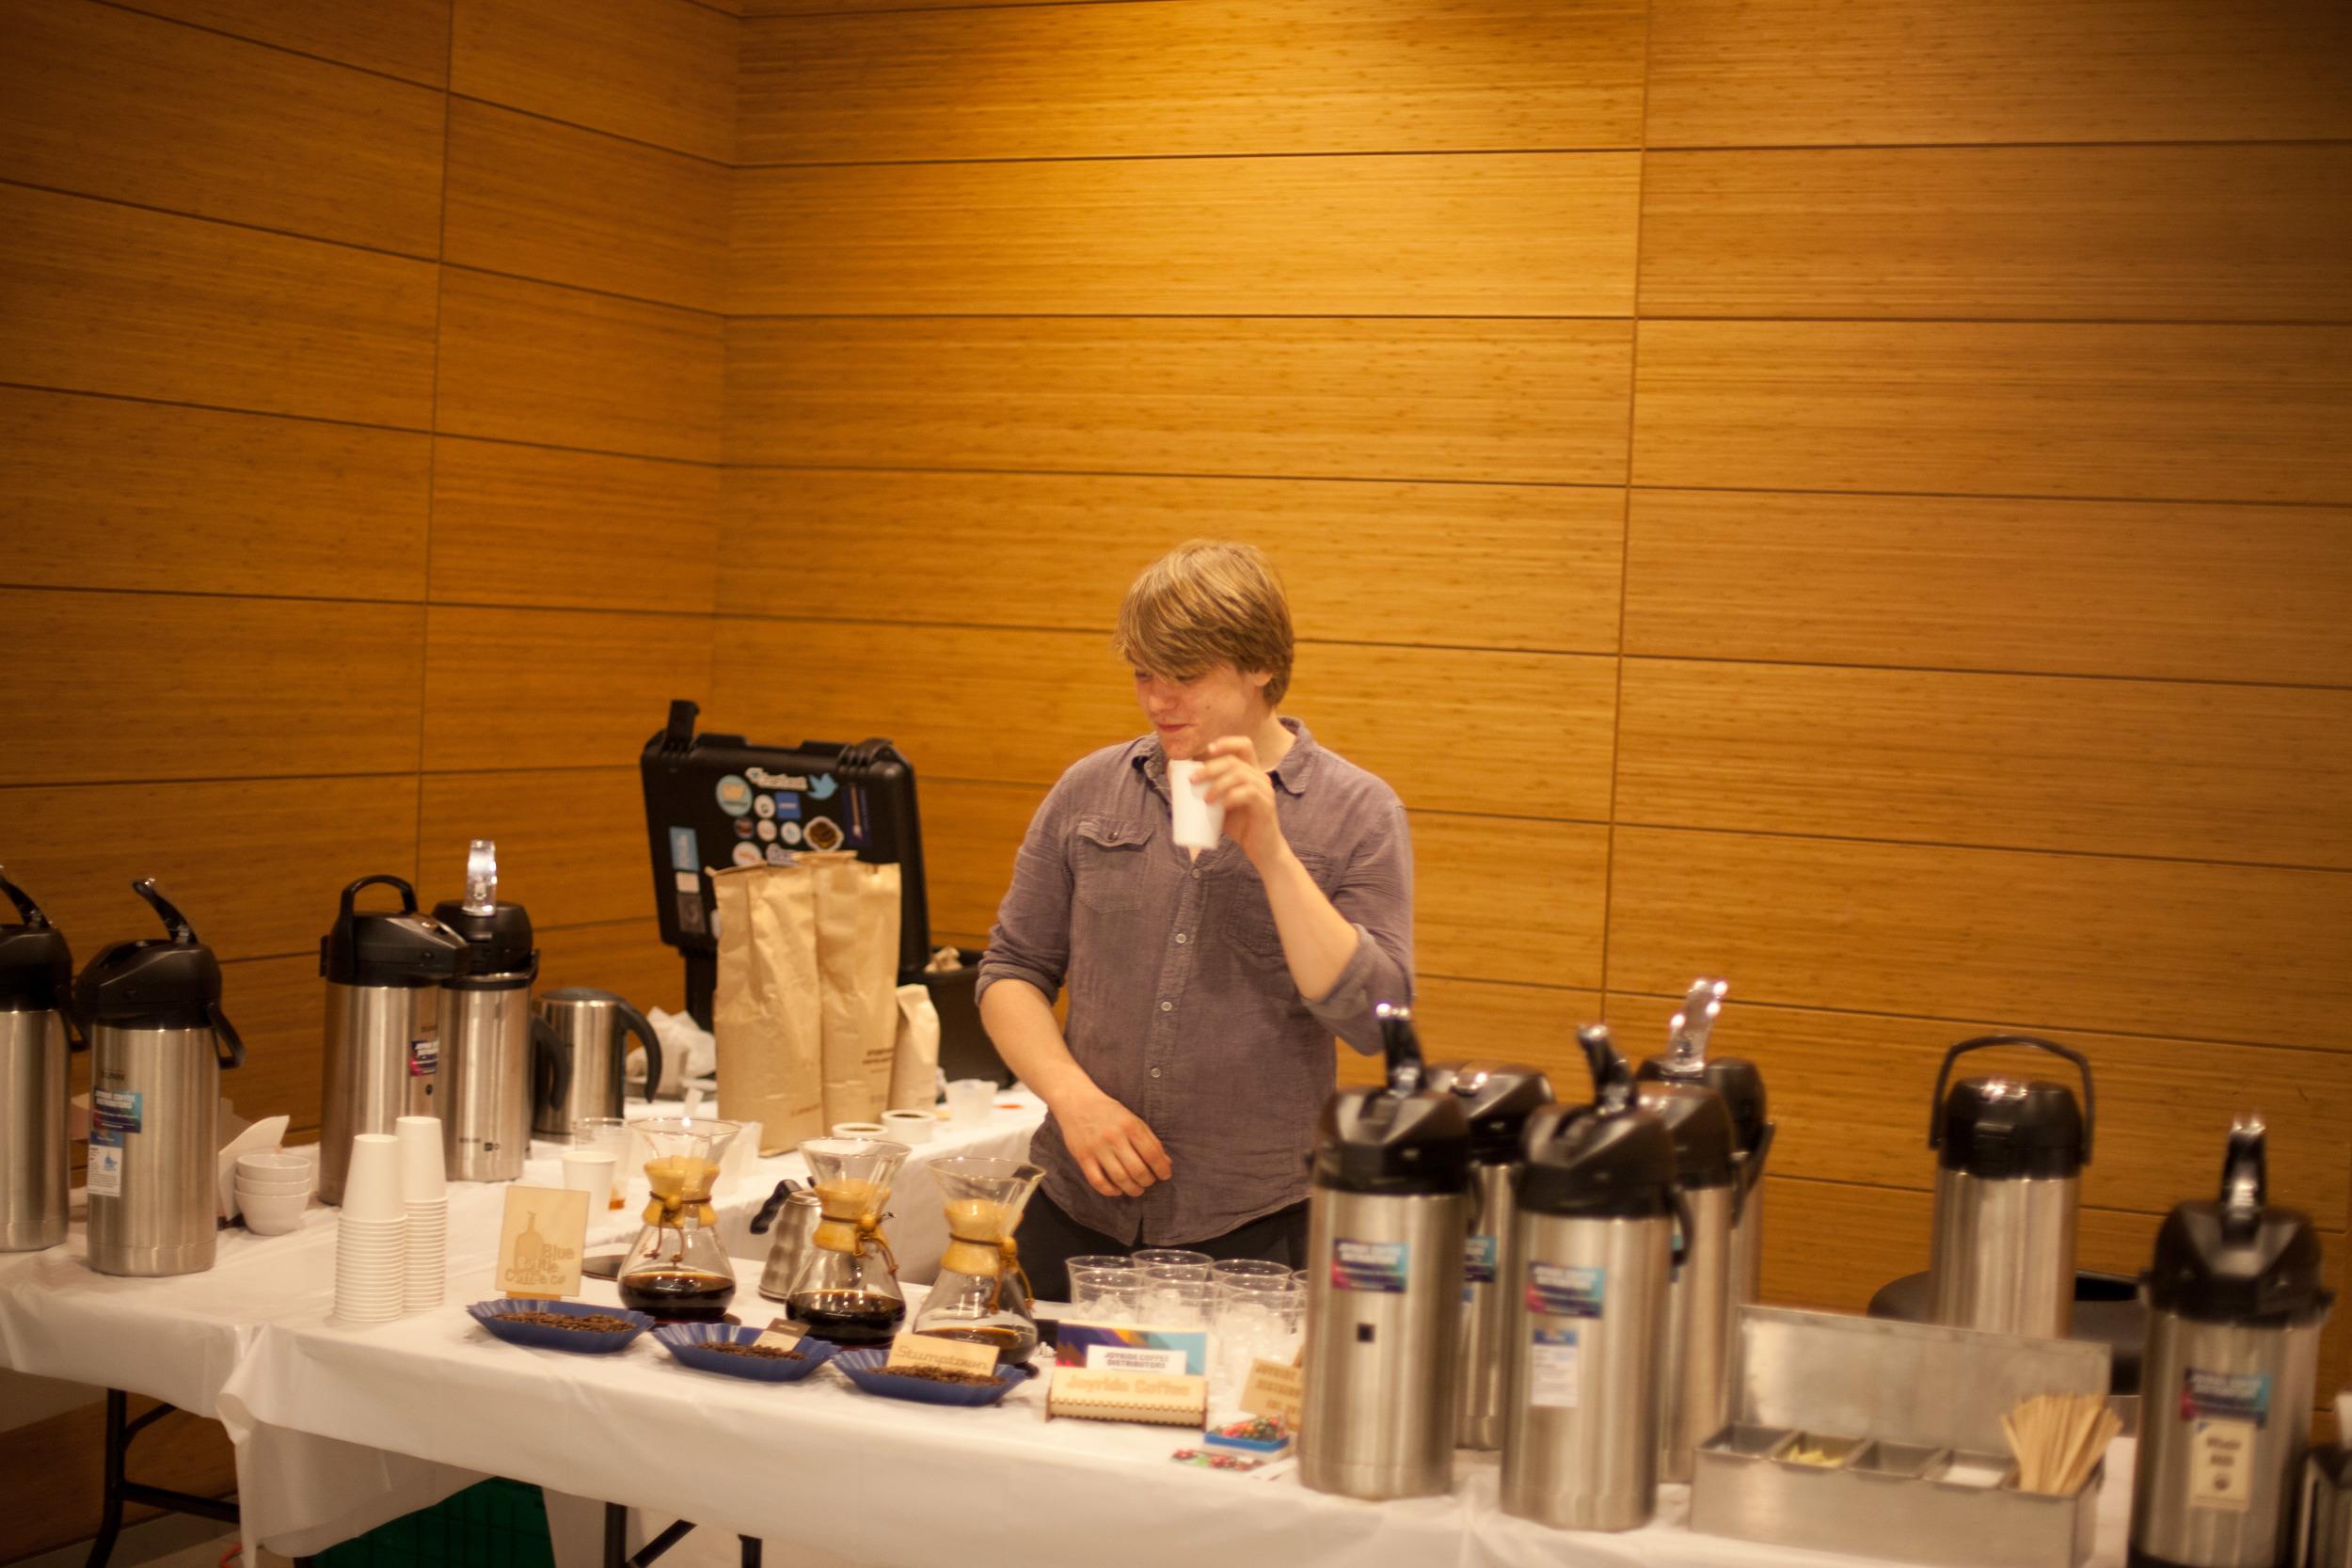 Joyride Coffee Catering